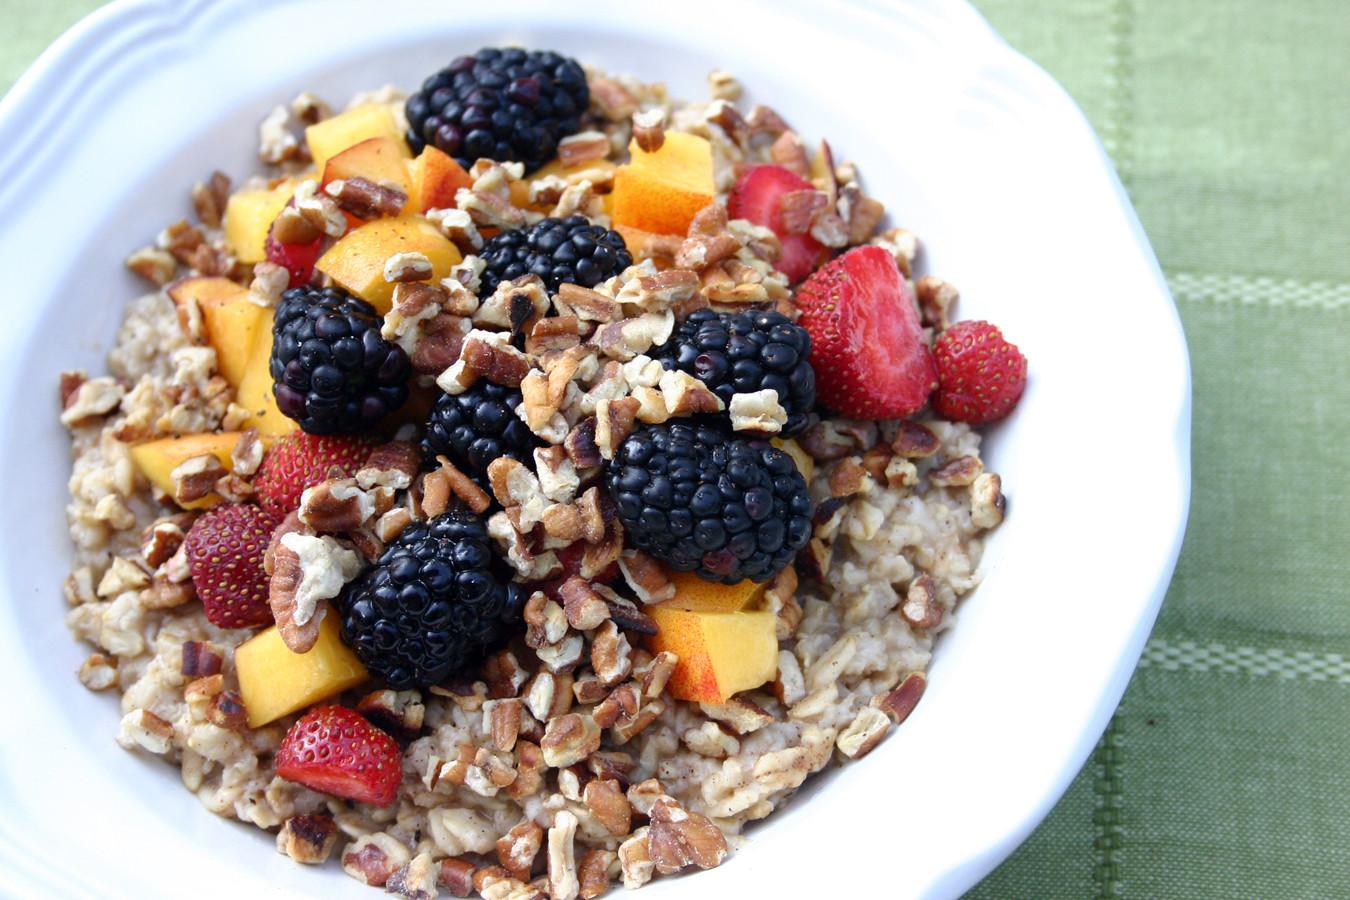 Oatmeal Healthy Breakfast  Balanced Weekend Breakfasts Yum